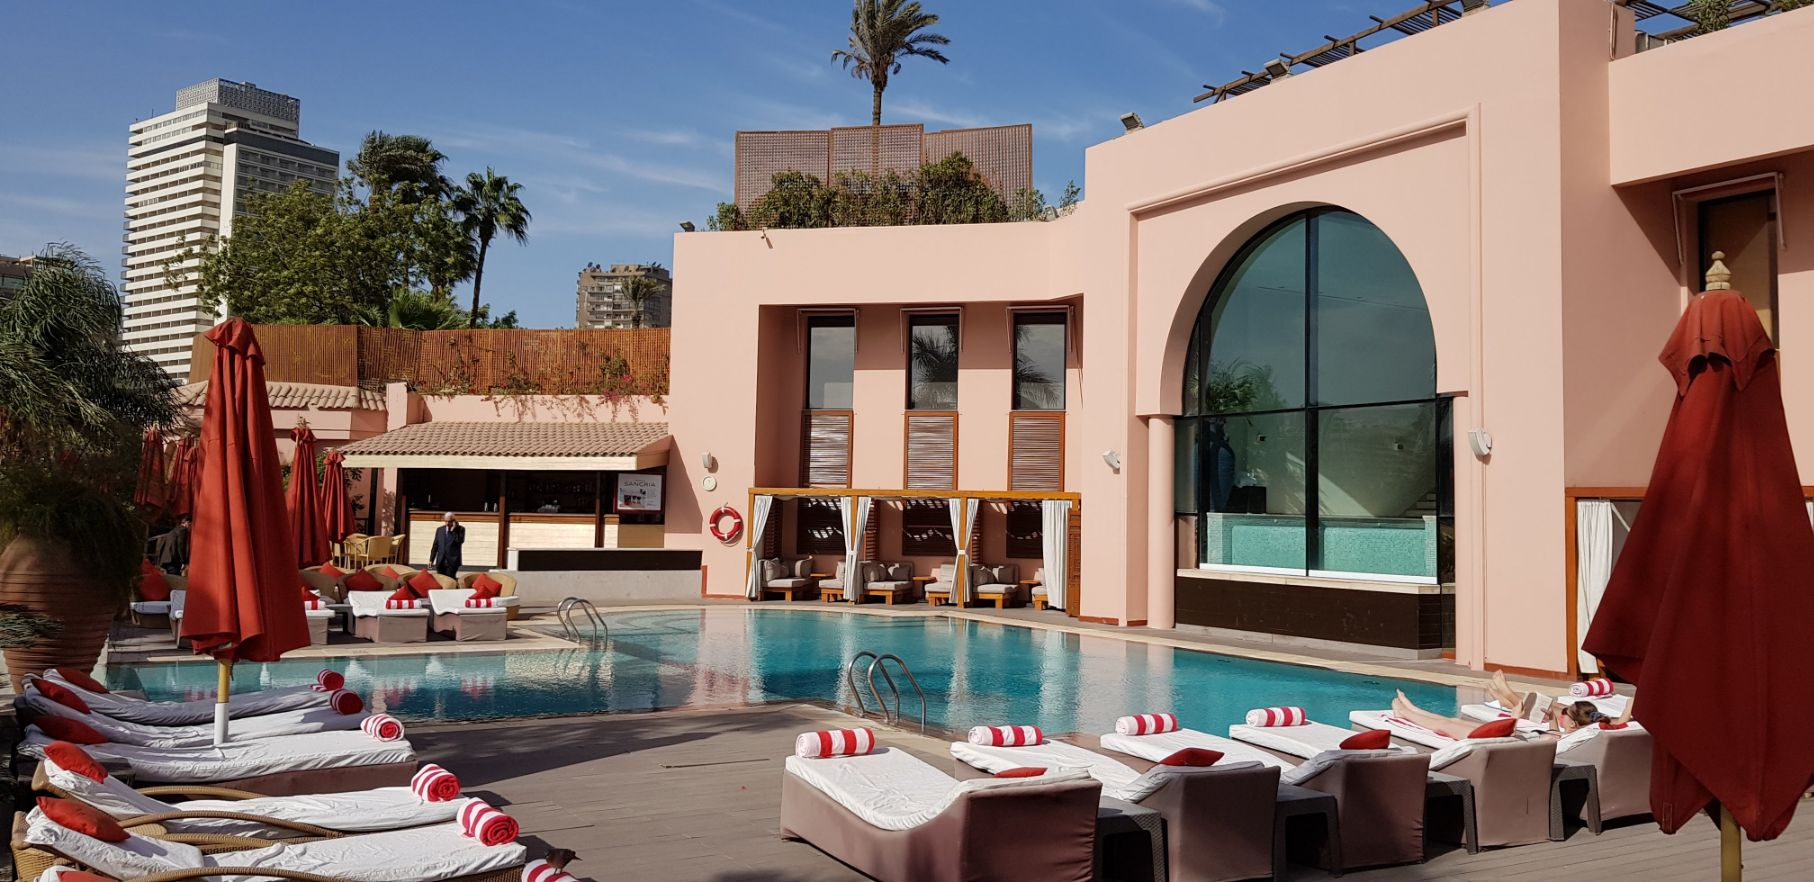 Hotel Sofitel Cairo Nile El Gezirah - Área de piscina